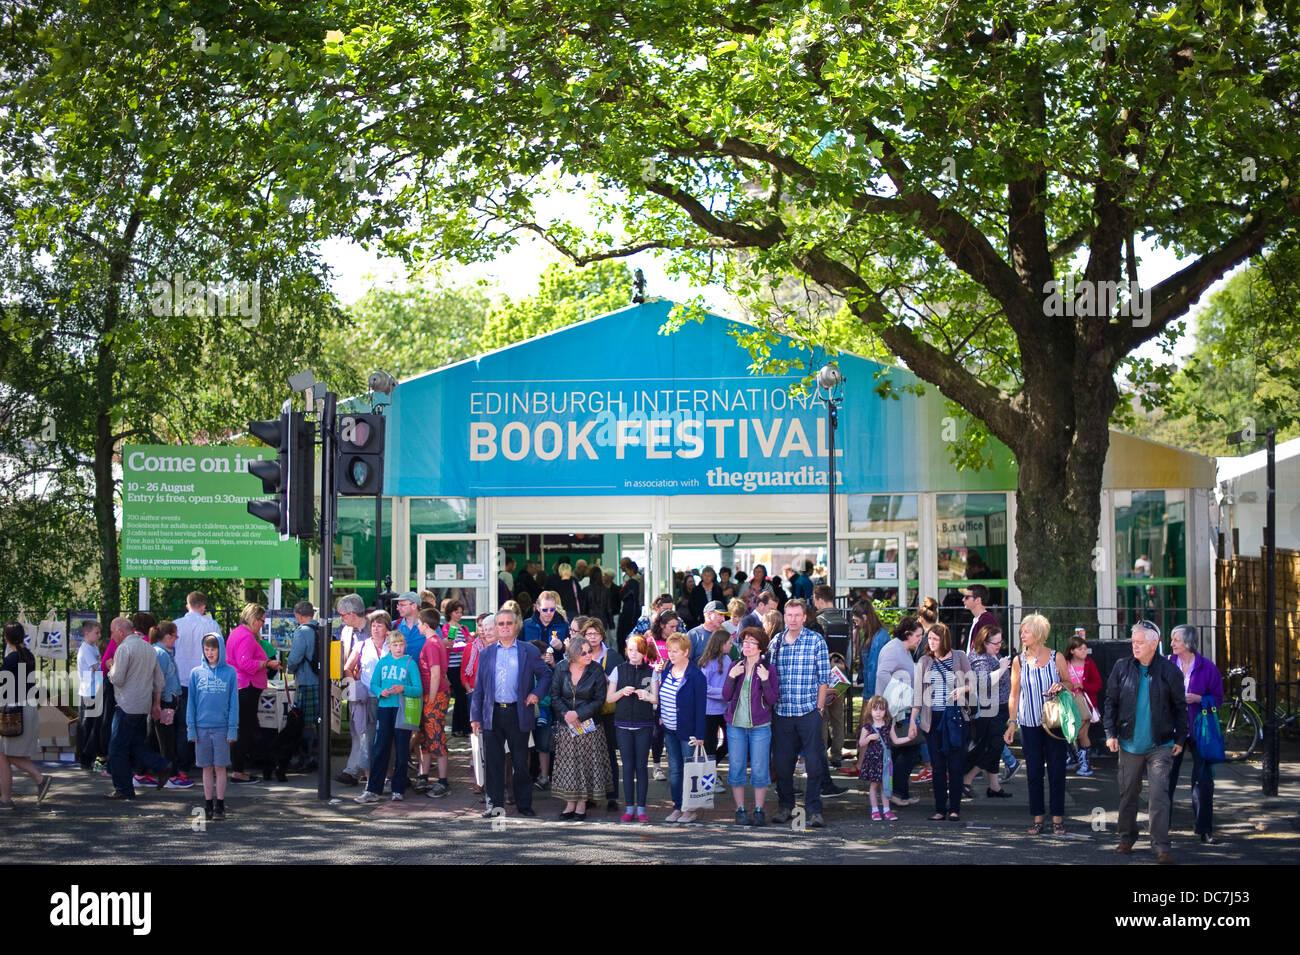 Edinburgh, UK. 11th Aug, 2013. The Edinburgh International Book Festival. Credit: Steven Scott Taylor/ Alamy Live - Stock Image